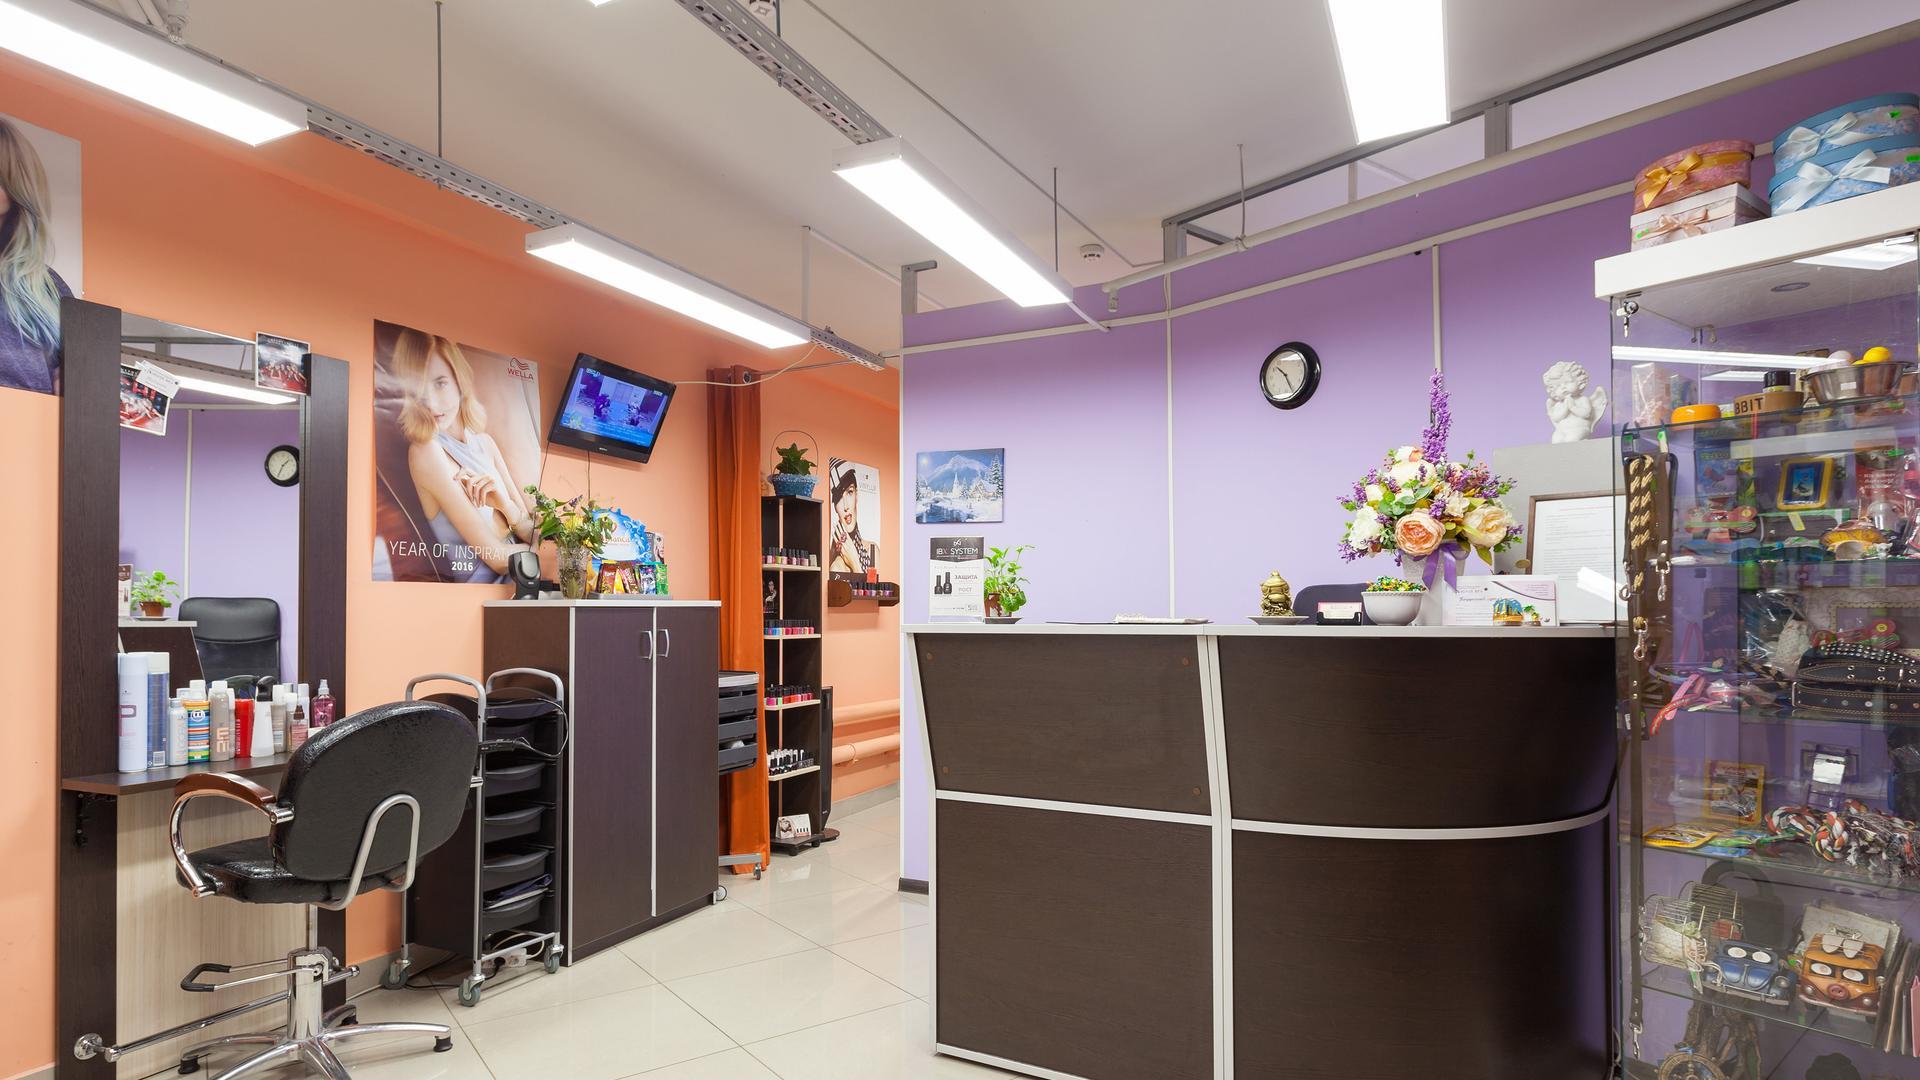 Салон интимного массажа ул академика янгеля 13 фотография